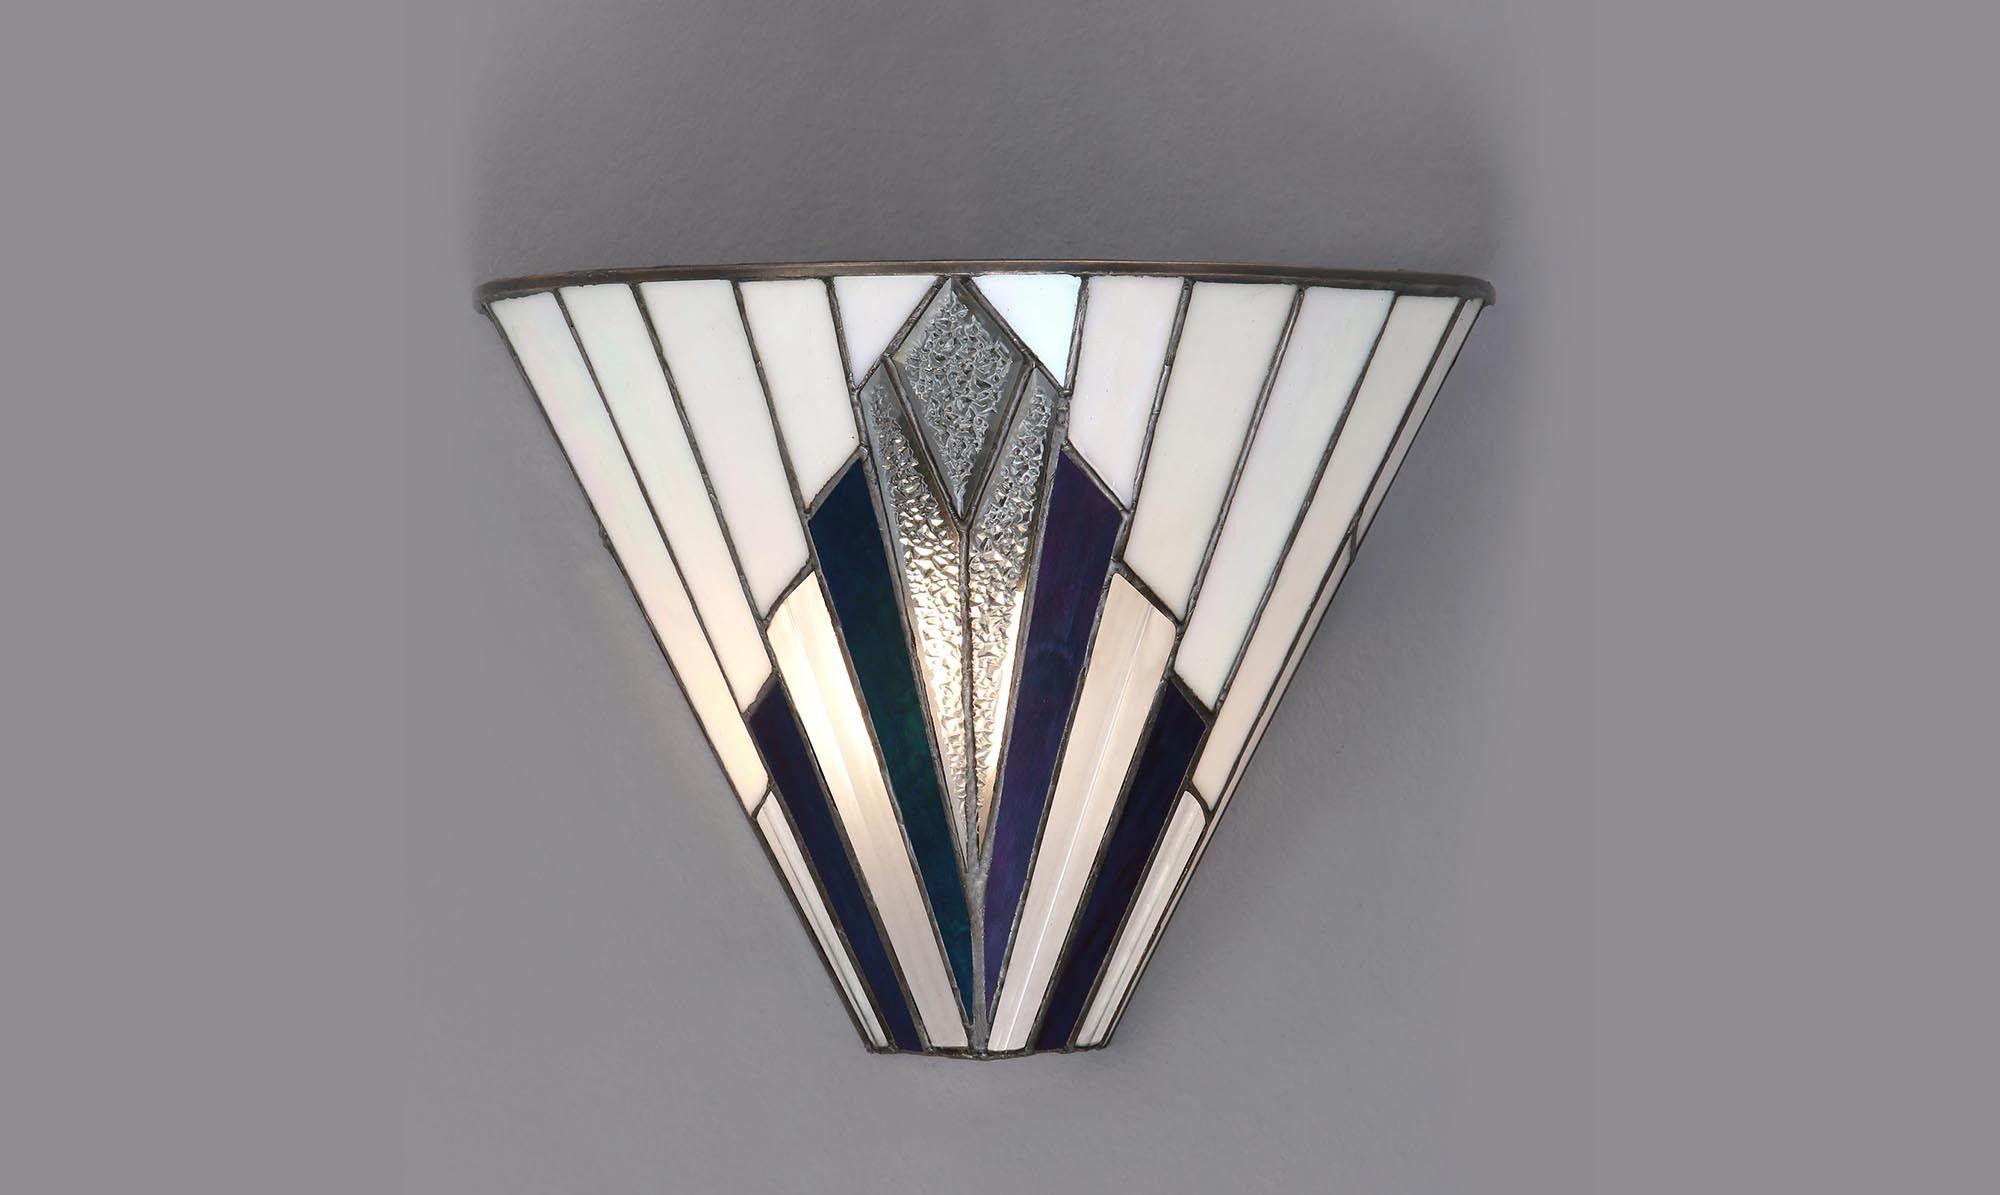 Tiffany wall lamp art deco the most beautiful tiffany lamps